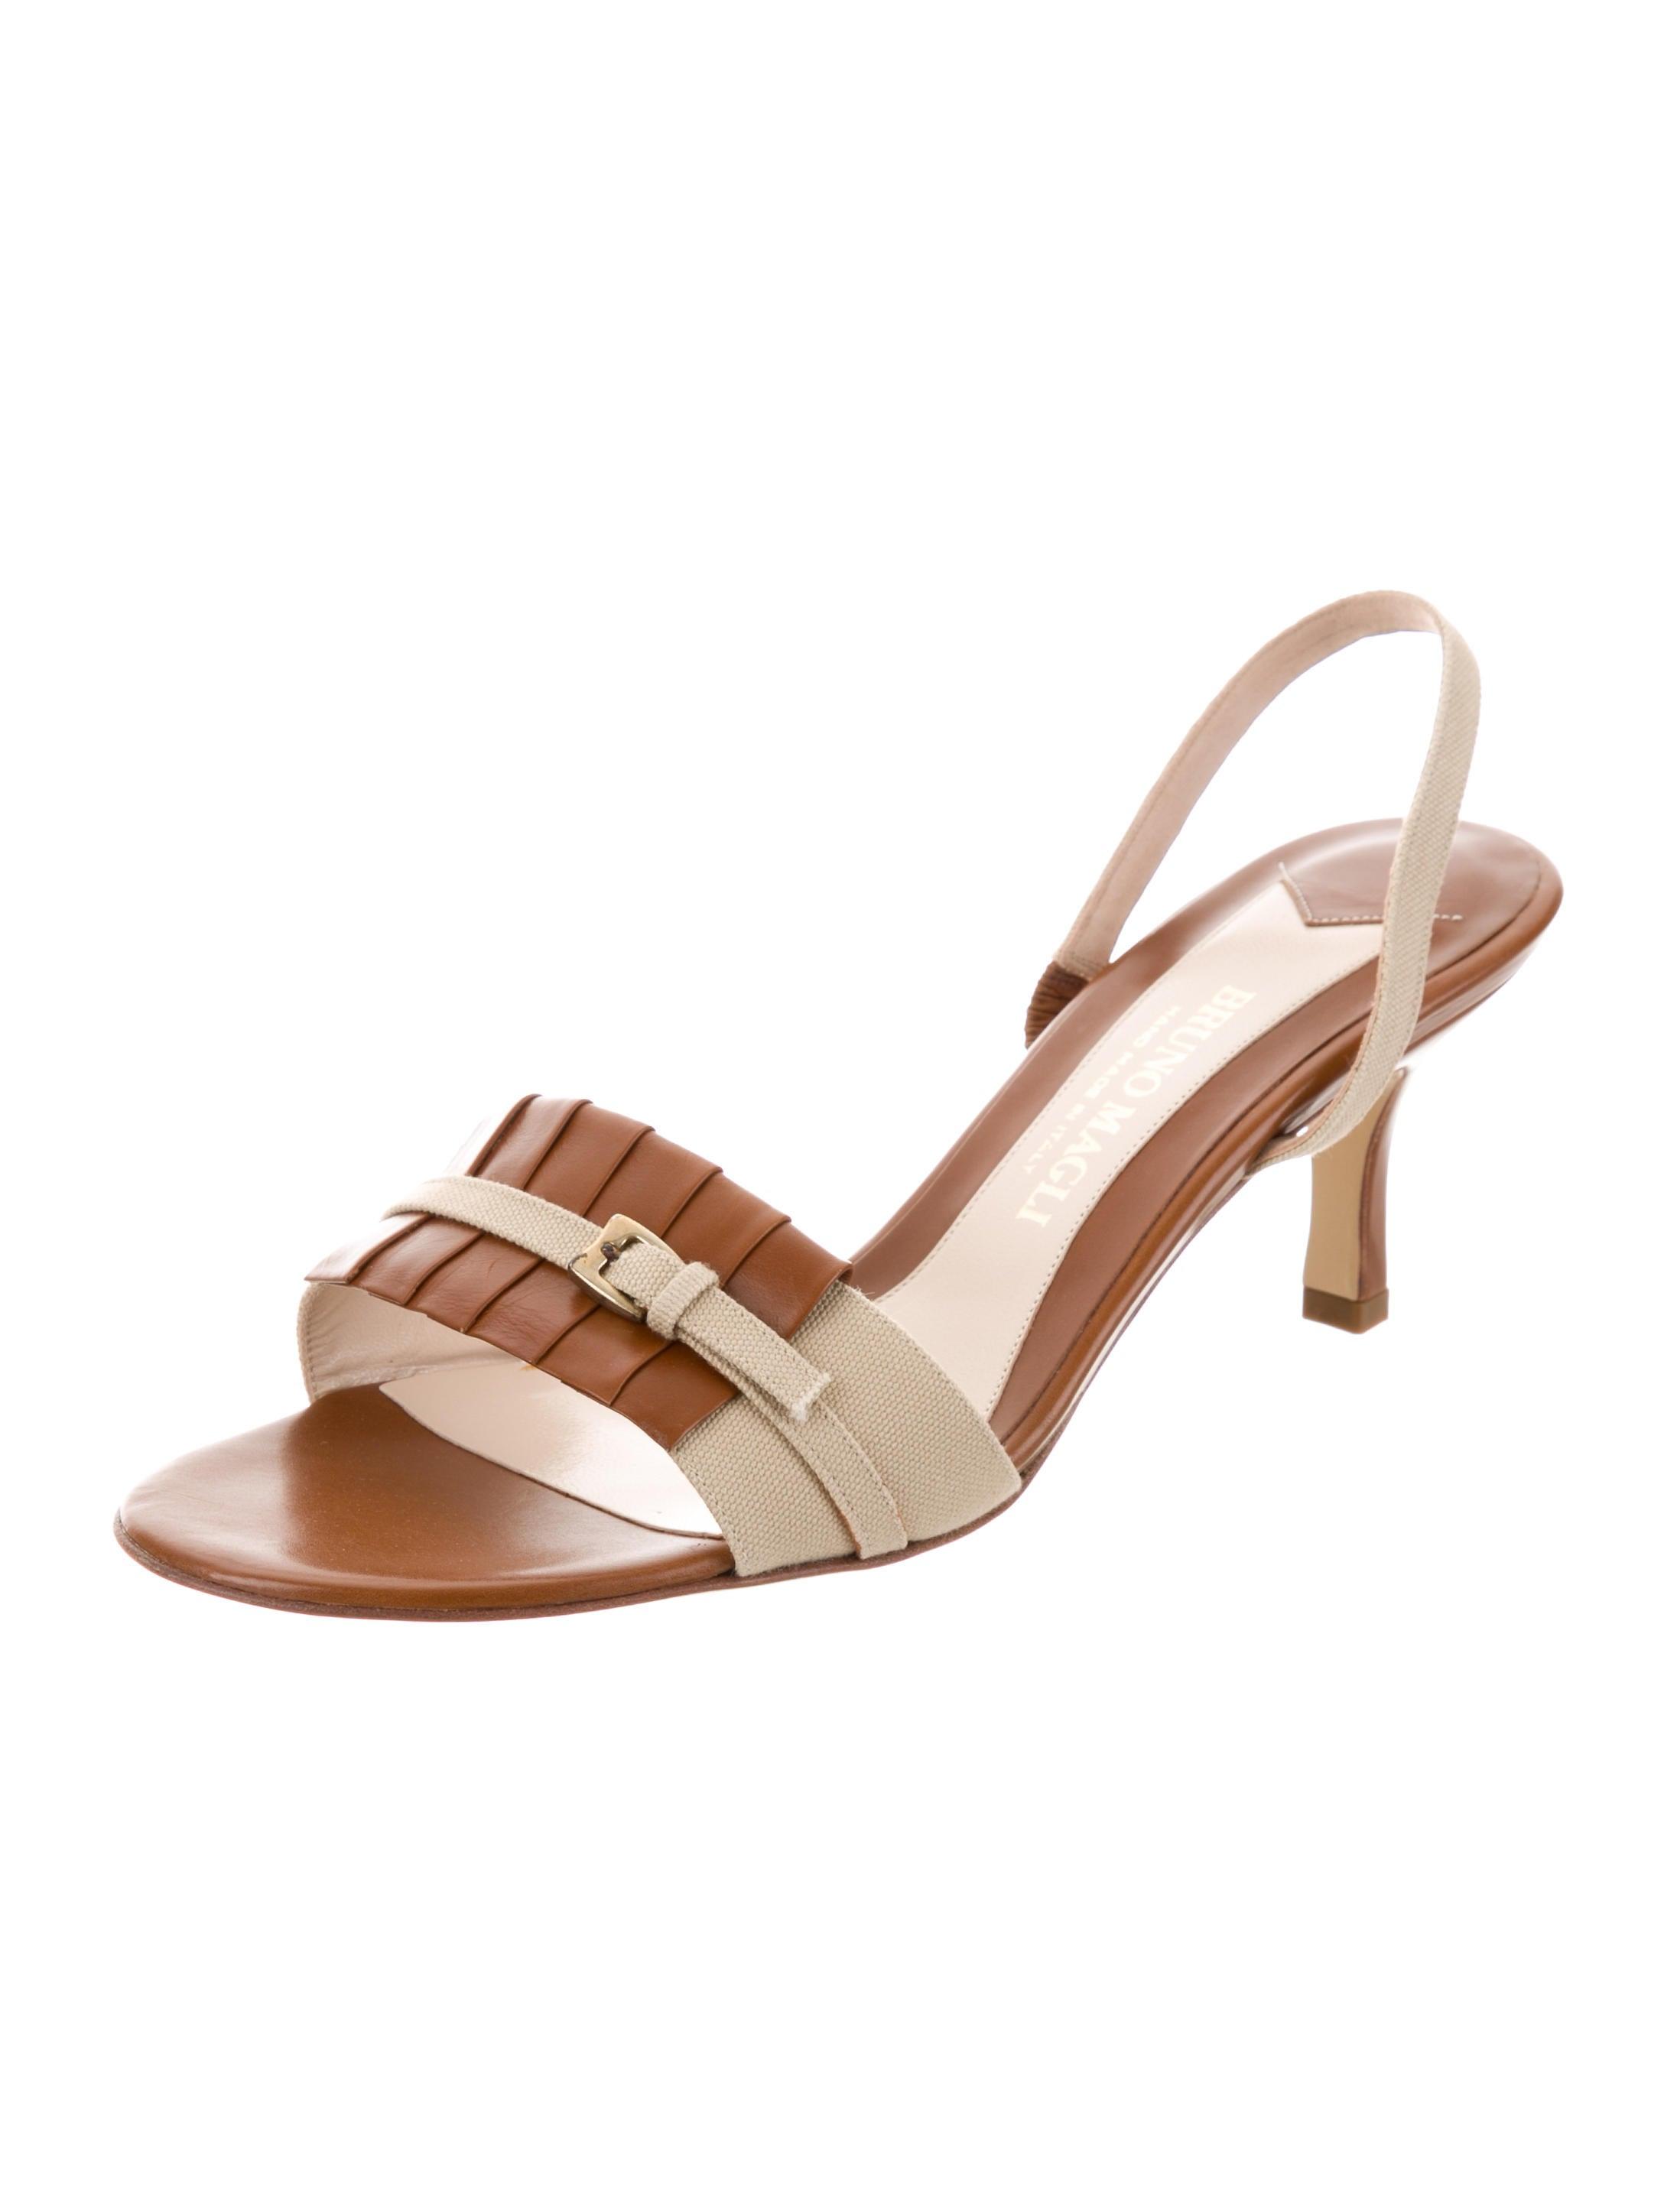 Bruno Magli Viola Slingback Sandals w/ Tags fashionable sale online TXg65Es2